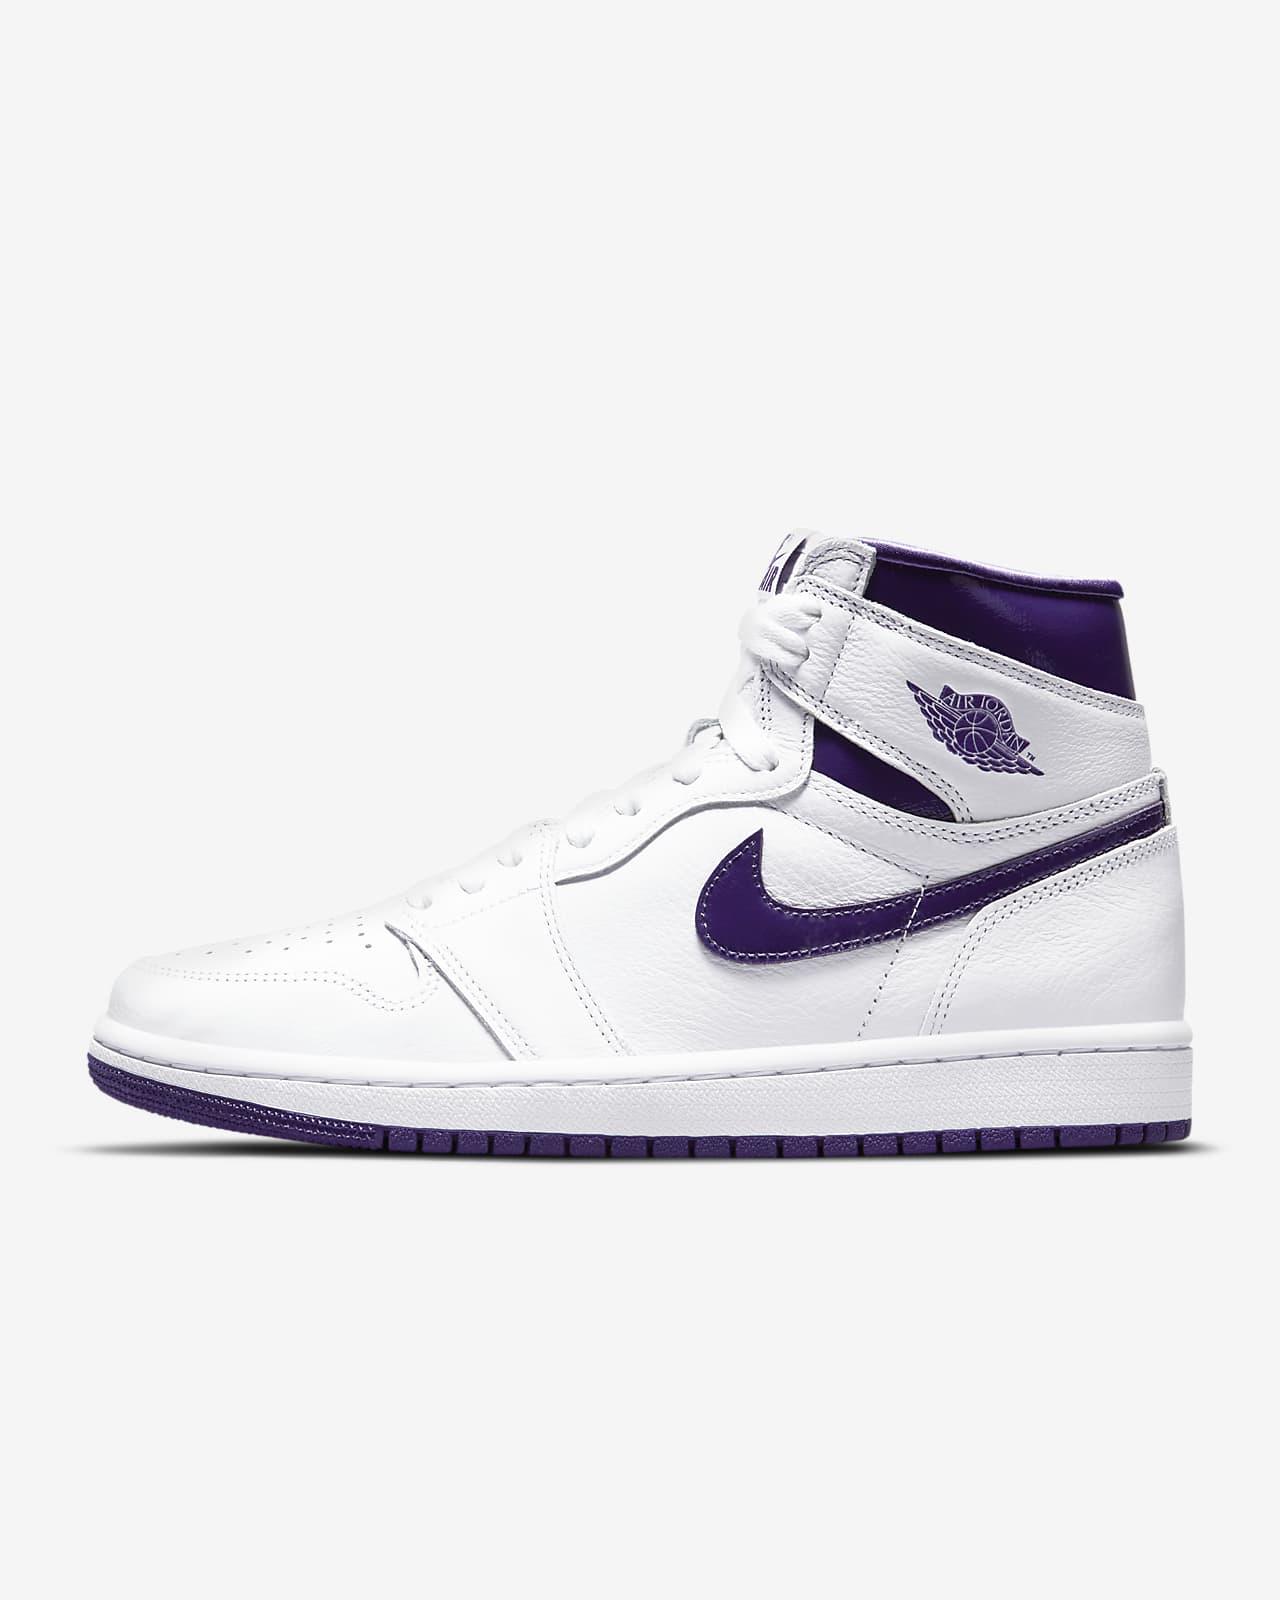 Air Jordan 1 Retro HI OG 女子运动鞋